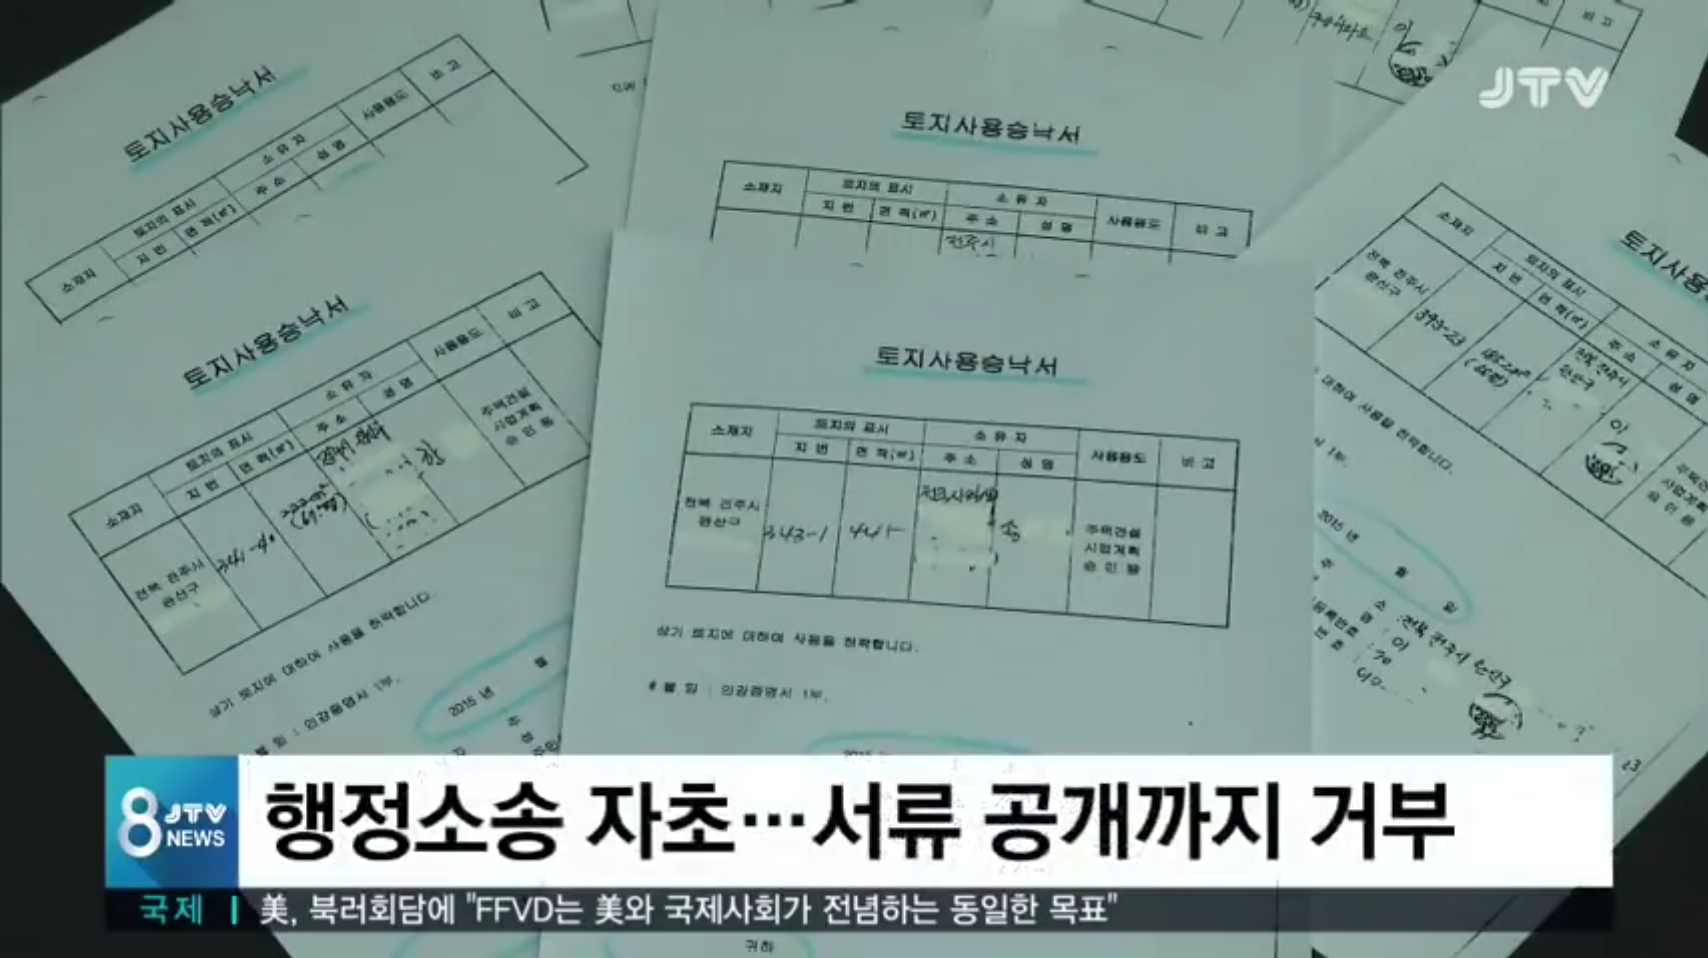 [19.4.24 JTV] 전주시, 아파트재개발 승인 허술, 정보공개 거부로 시민만 골탕11.png